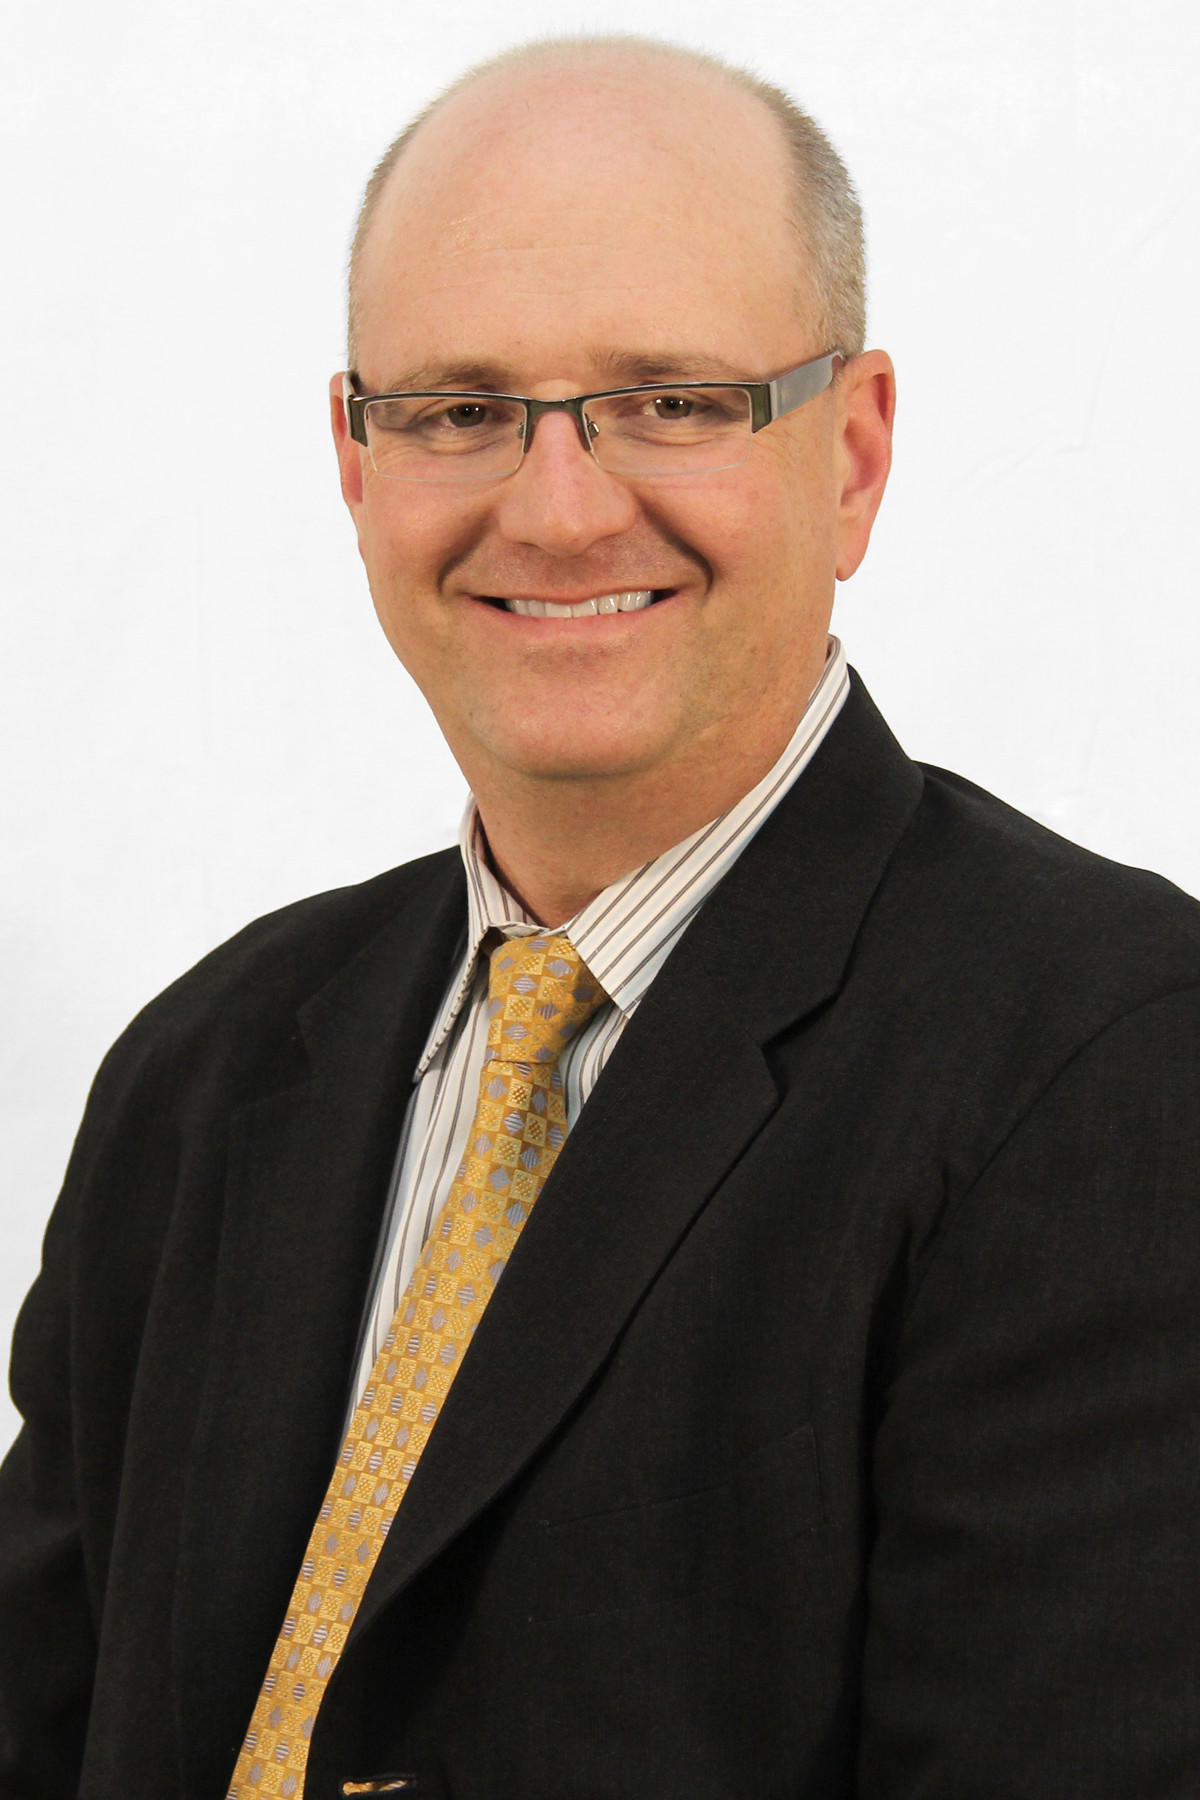 Jeff Tesch, managing director, RCN Capital.